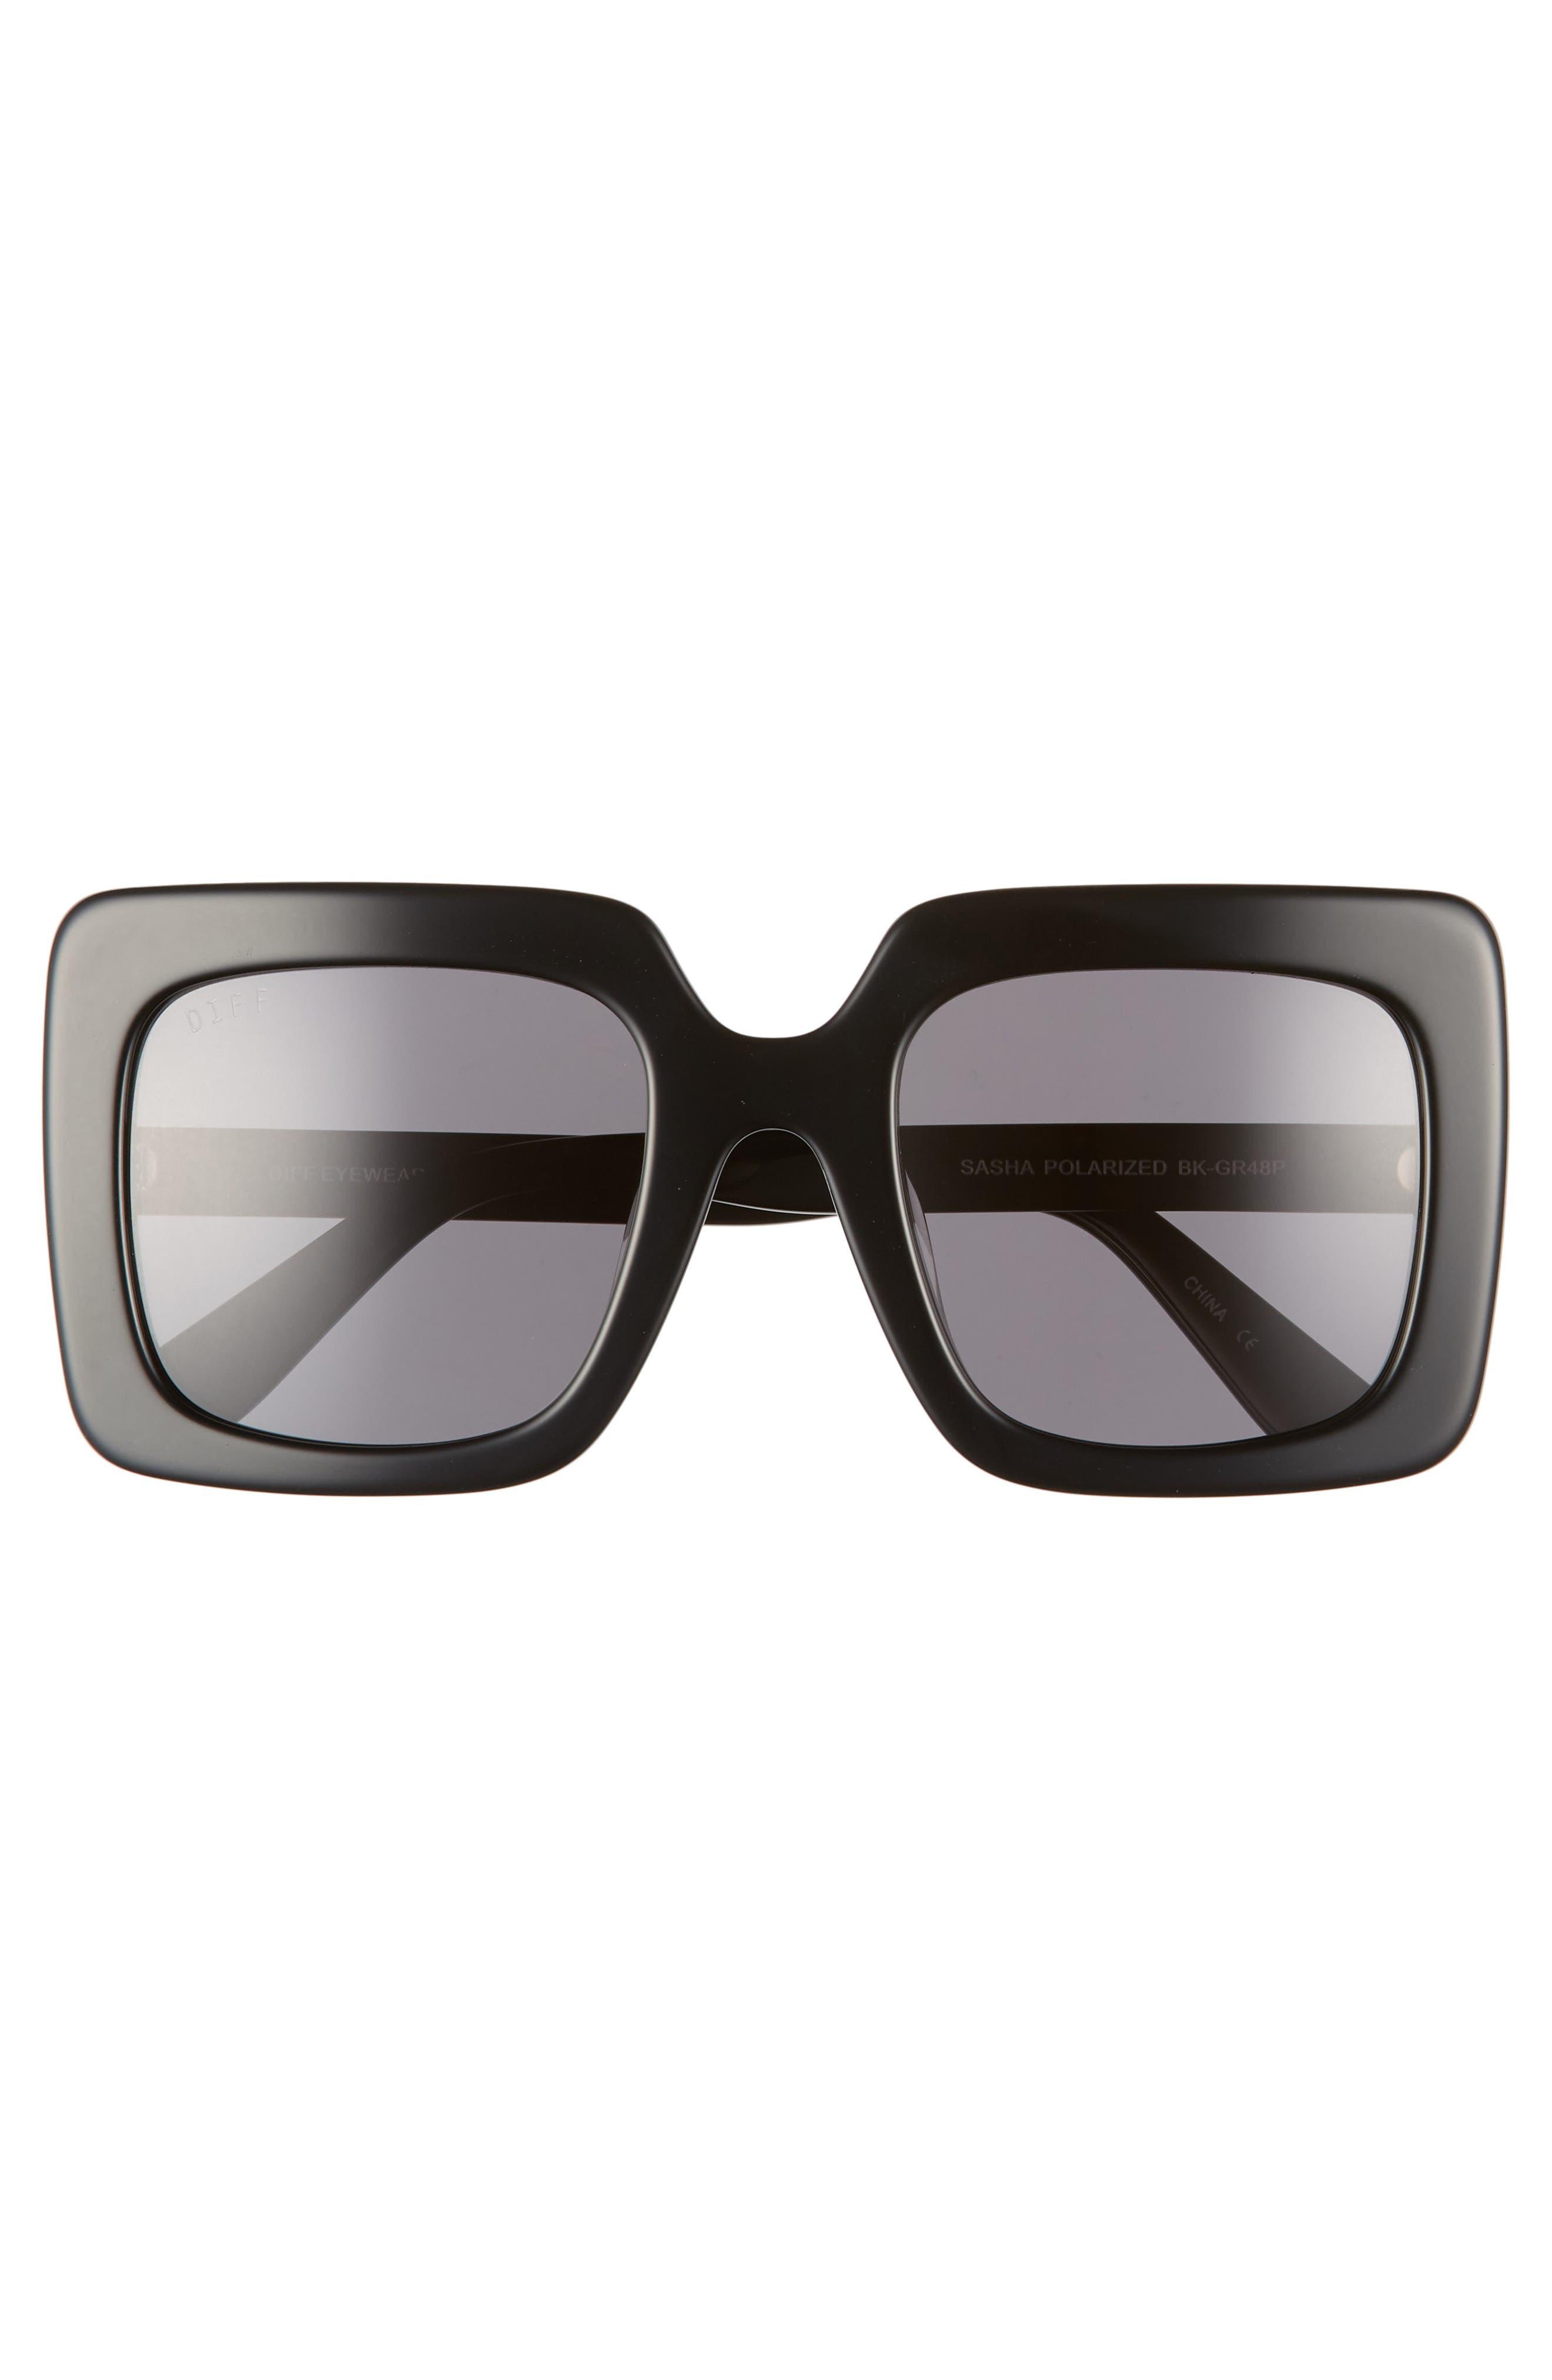 Sasha 53mm Polarized Sunglasses,                             Alternate thumbnail 3, color,                             BLACK/ GREY